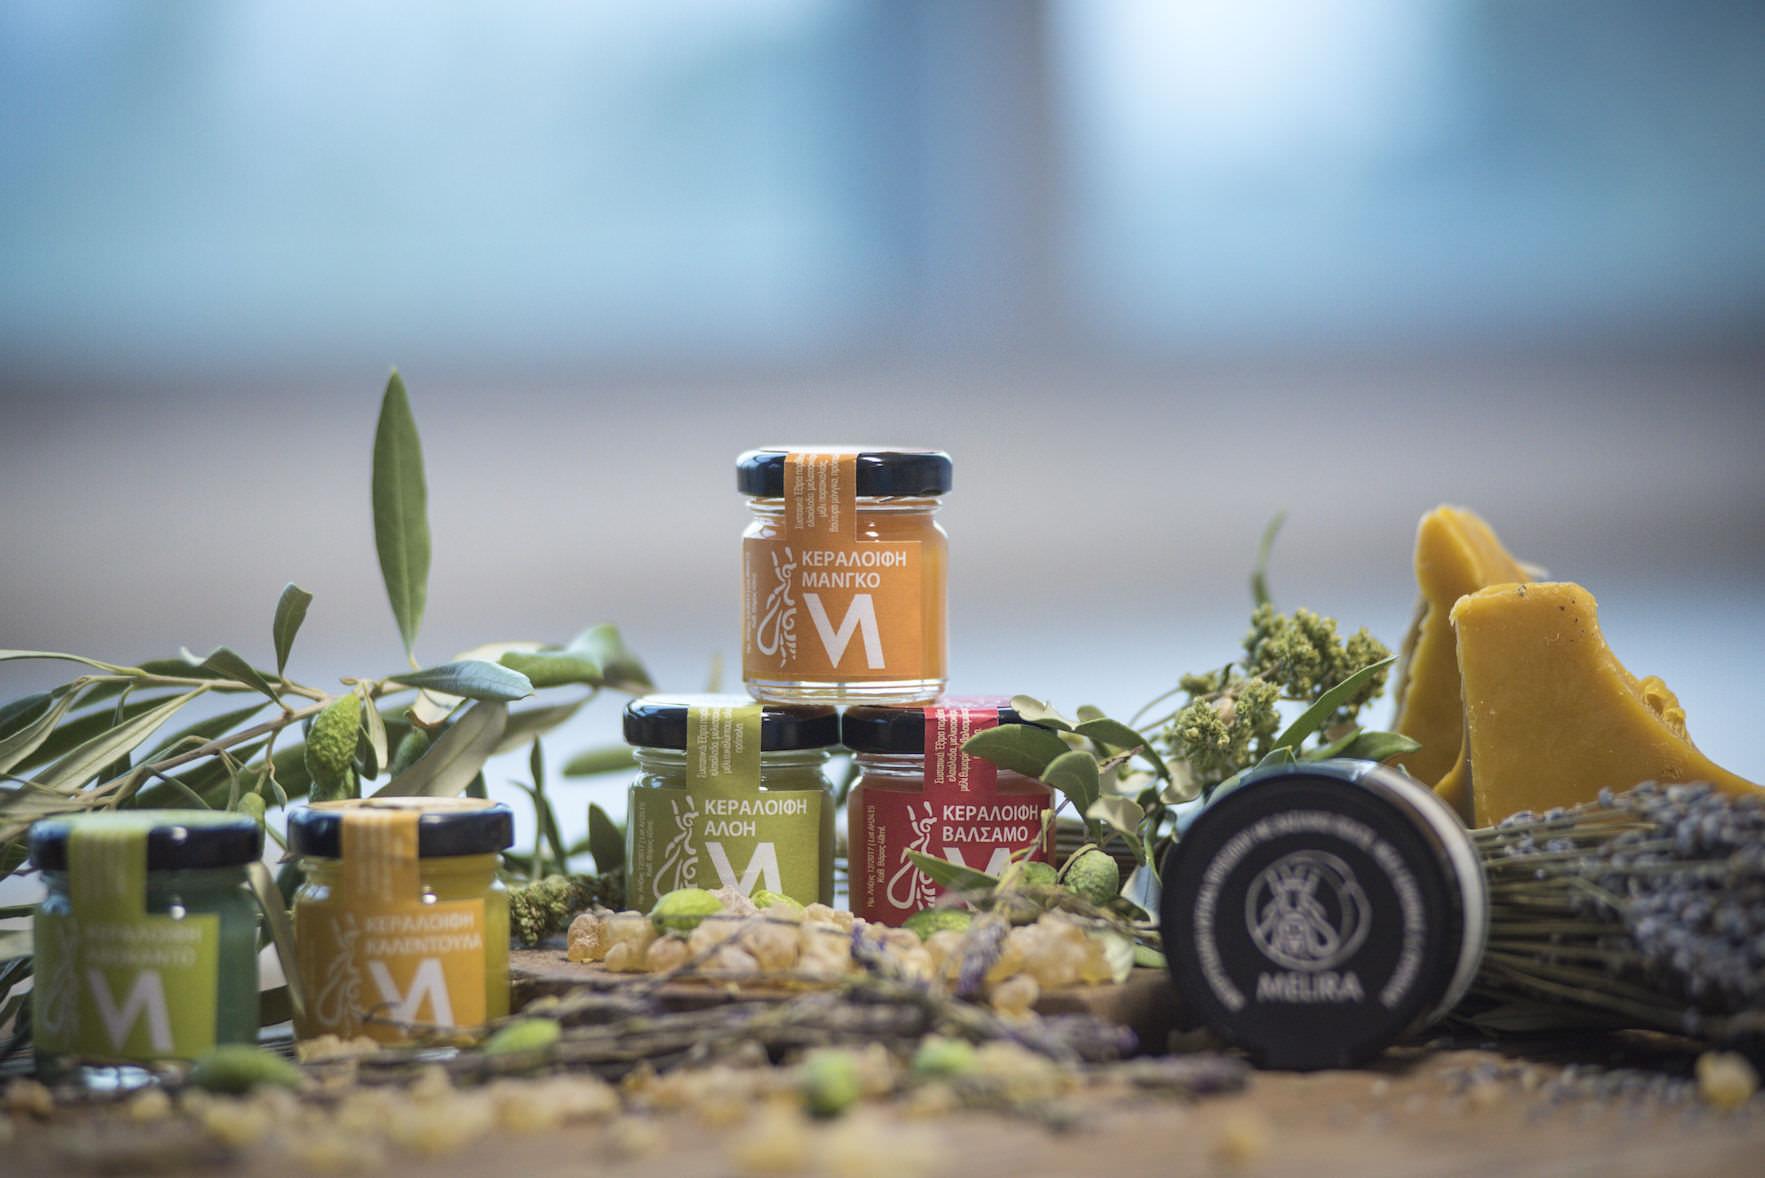 Melira: Το μέλι από την Εύβοια που ξετρέλανε τις διεθνείς αγορές